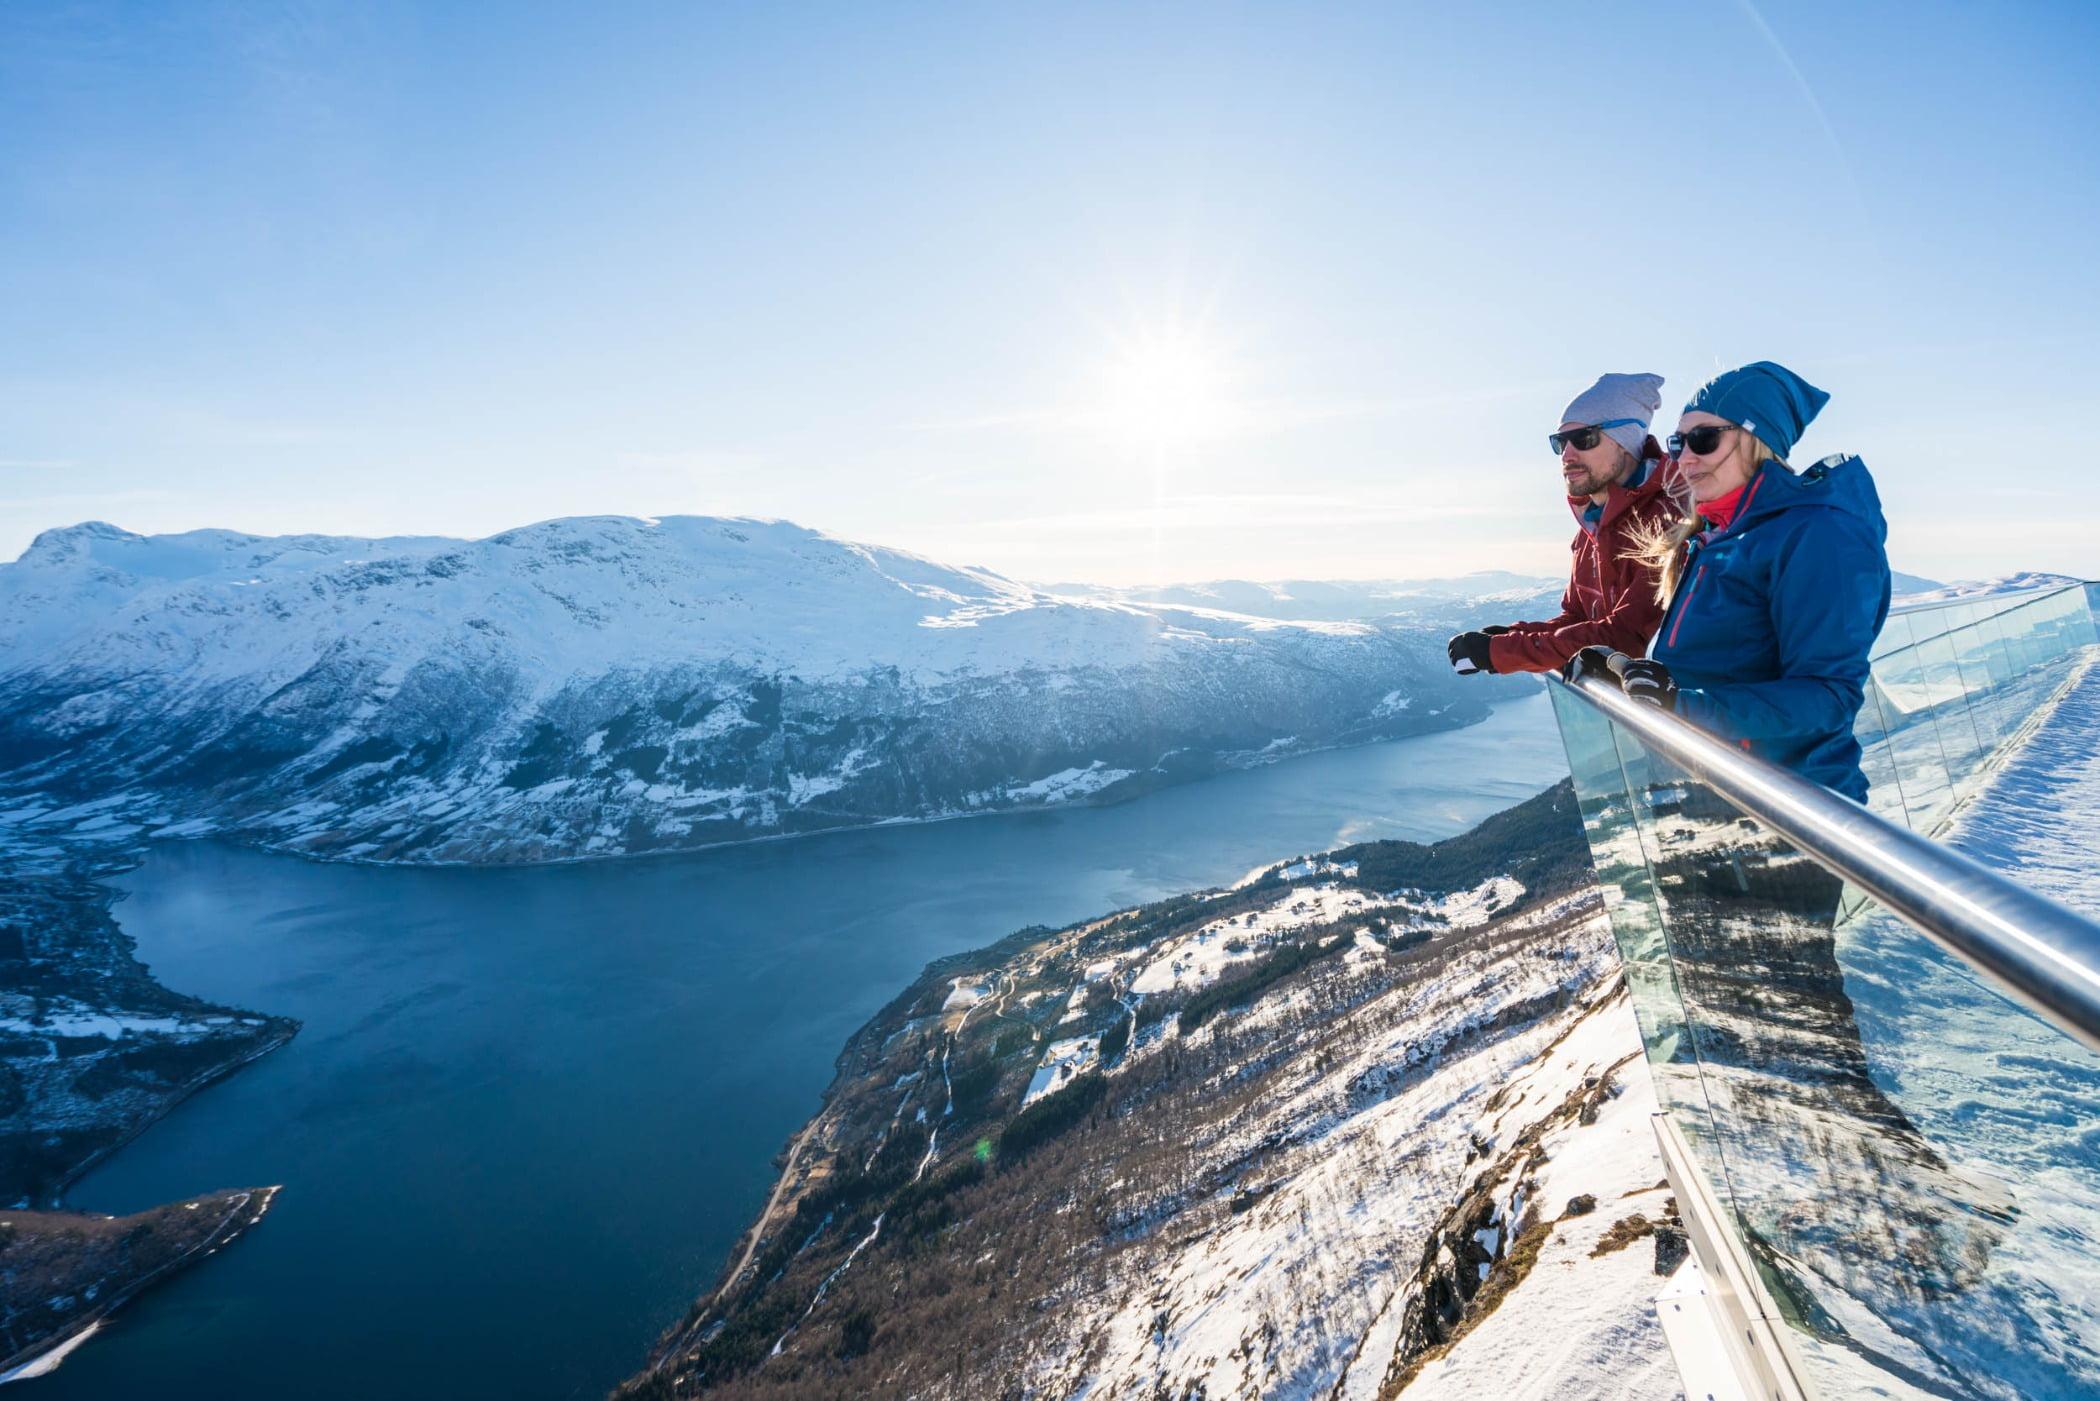 People in nature, Ice cap, Mountain range, Glacial landform, Mountainous landforms, Travel, Slope, Snow, Freezing, Winter